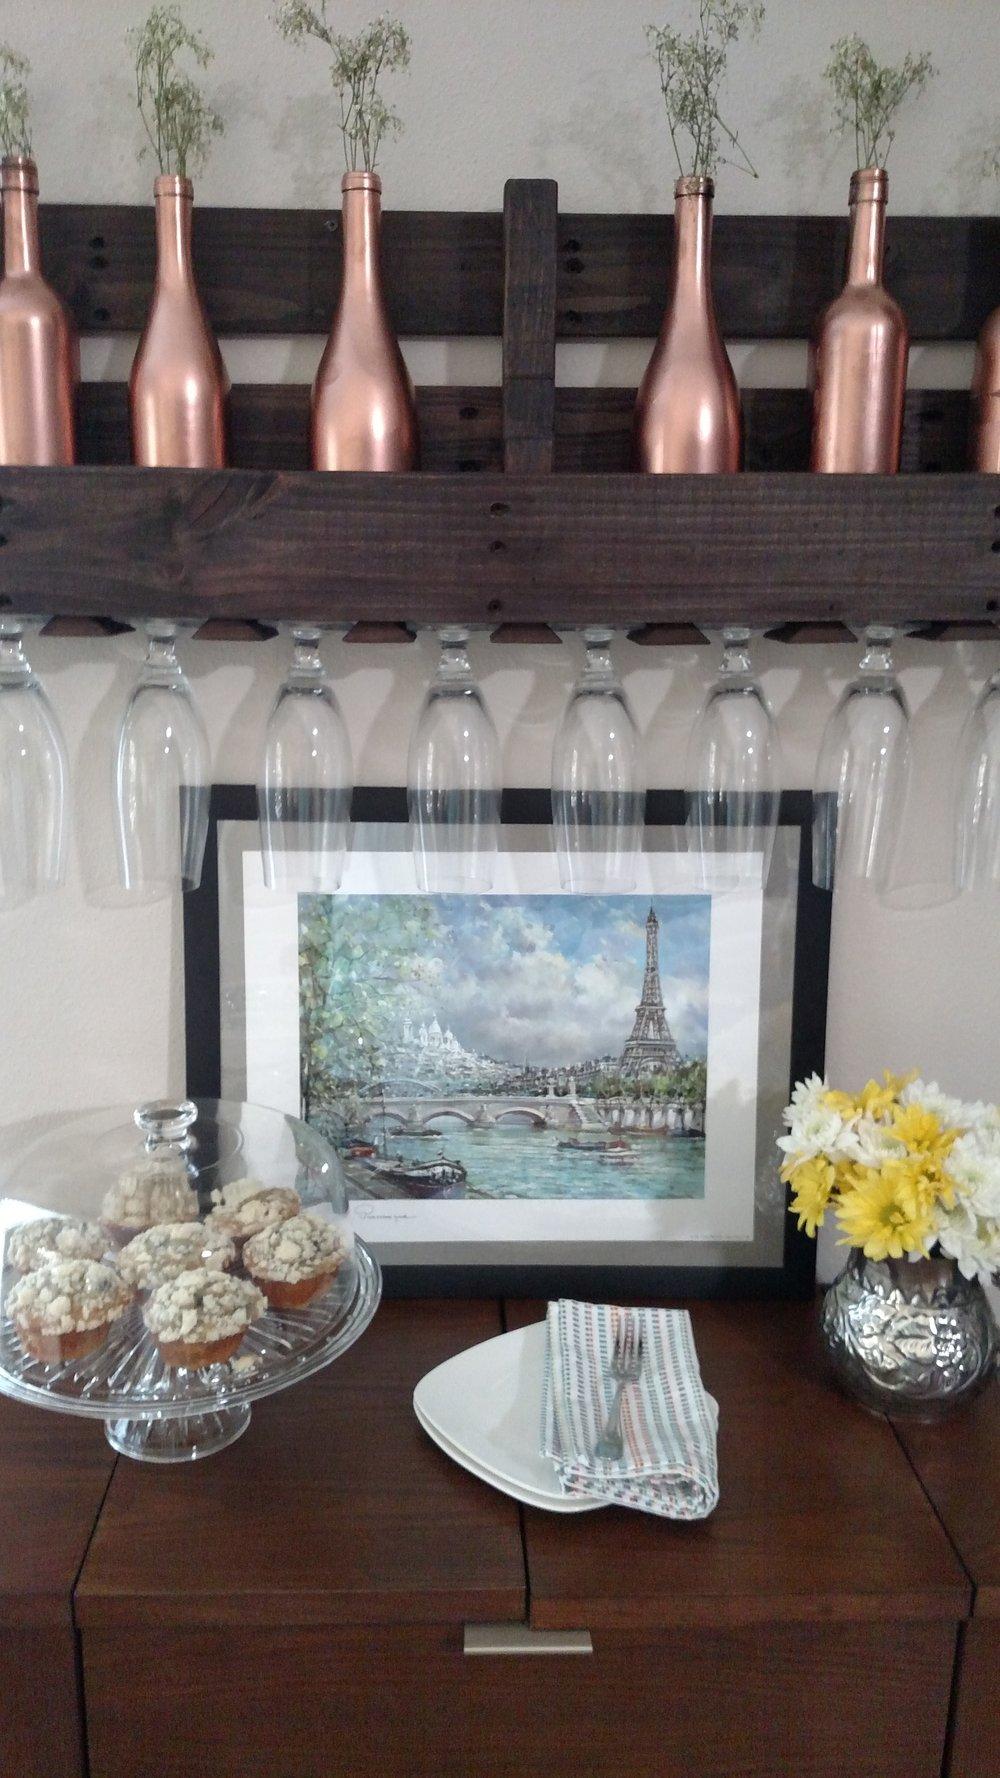 copper wine bottles